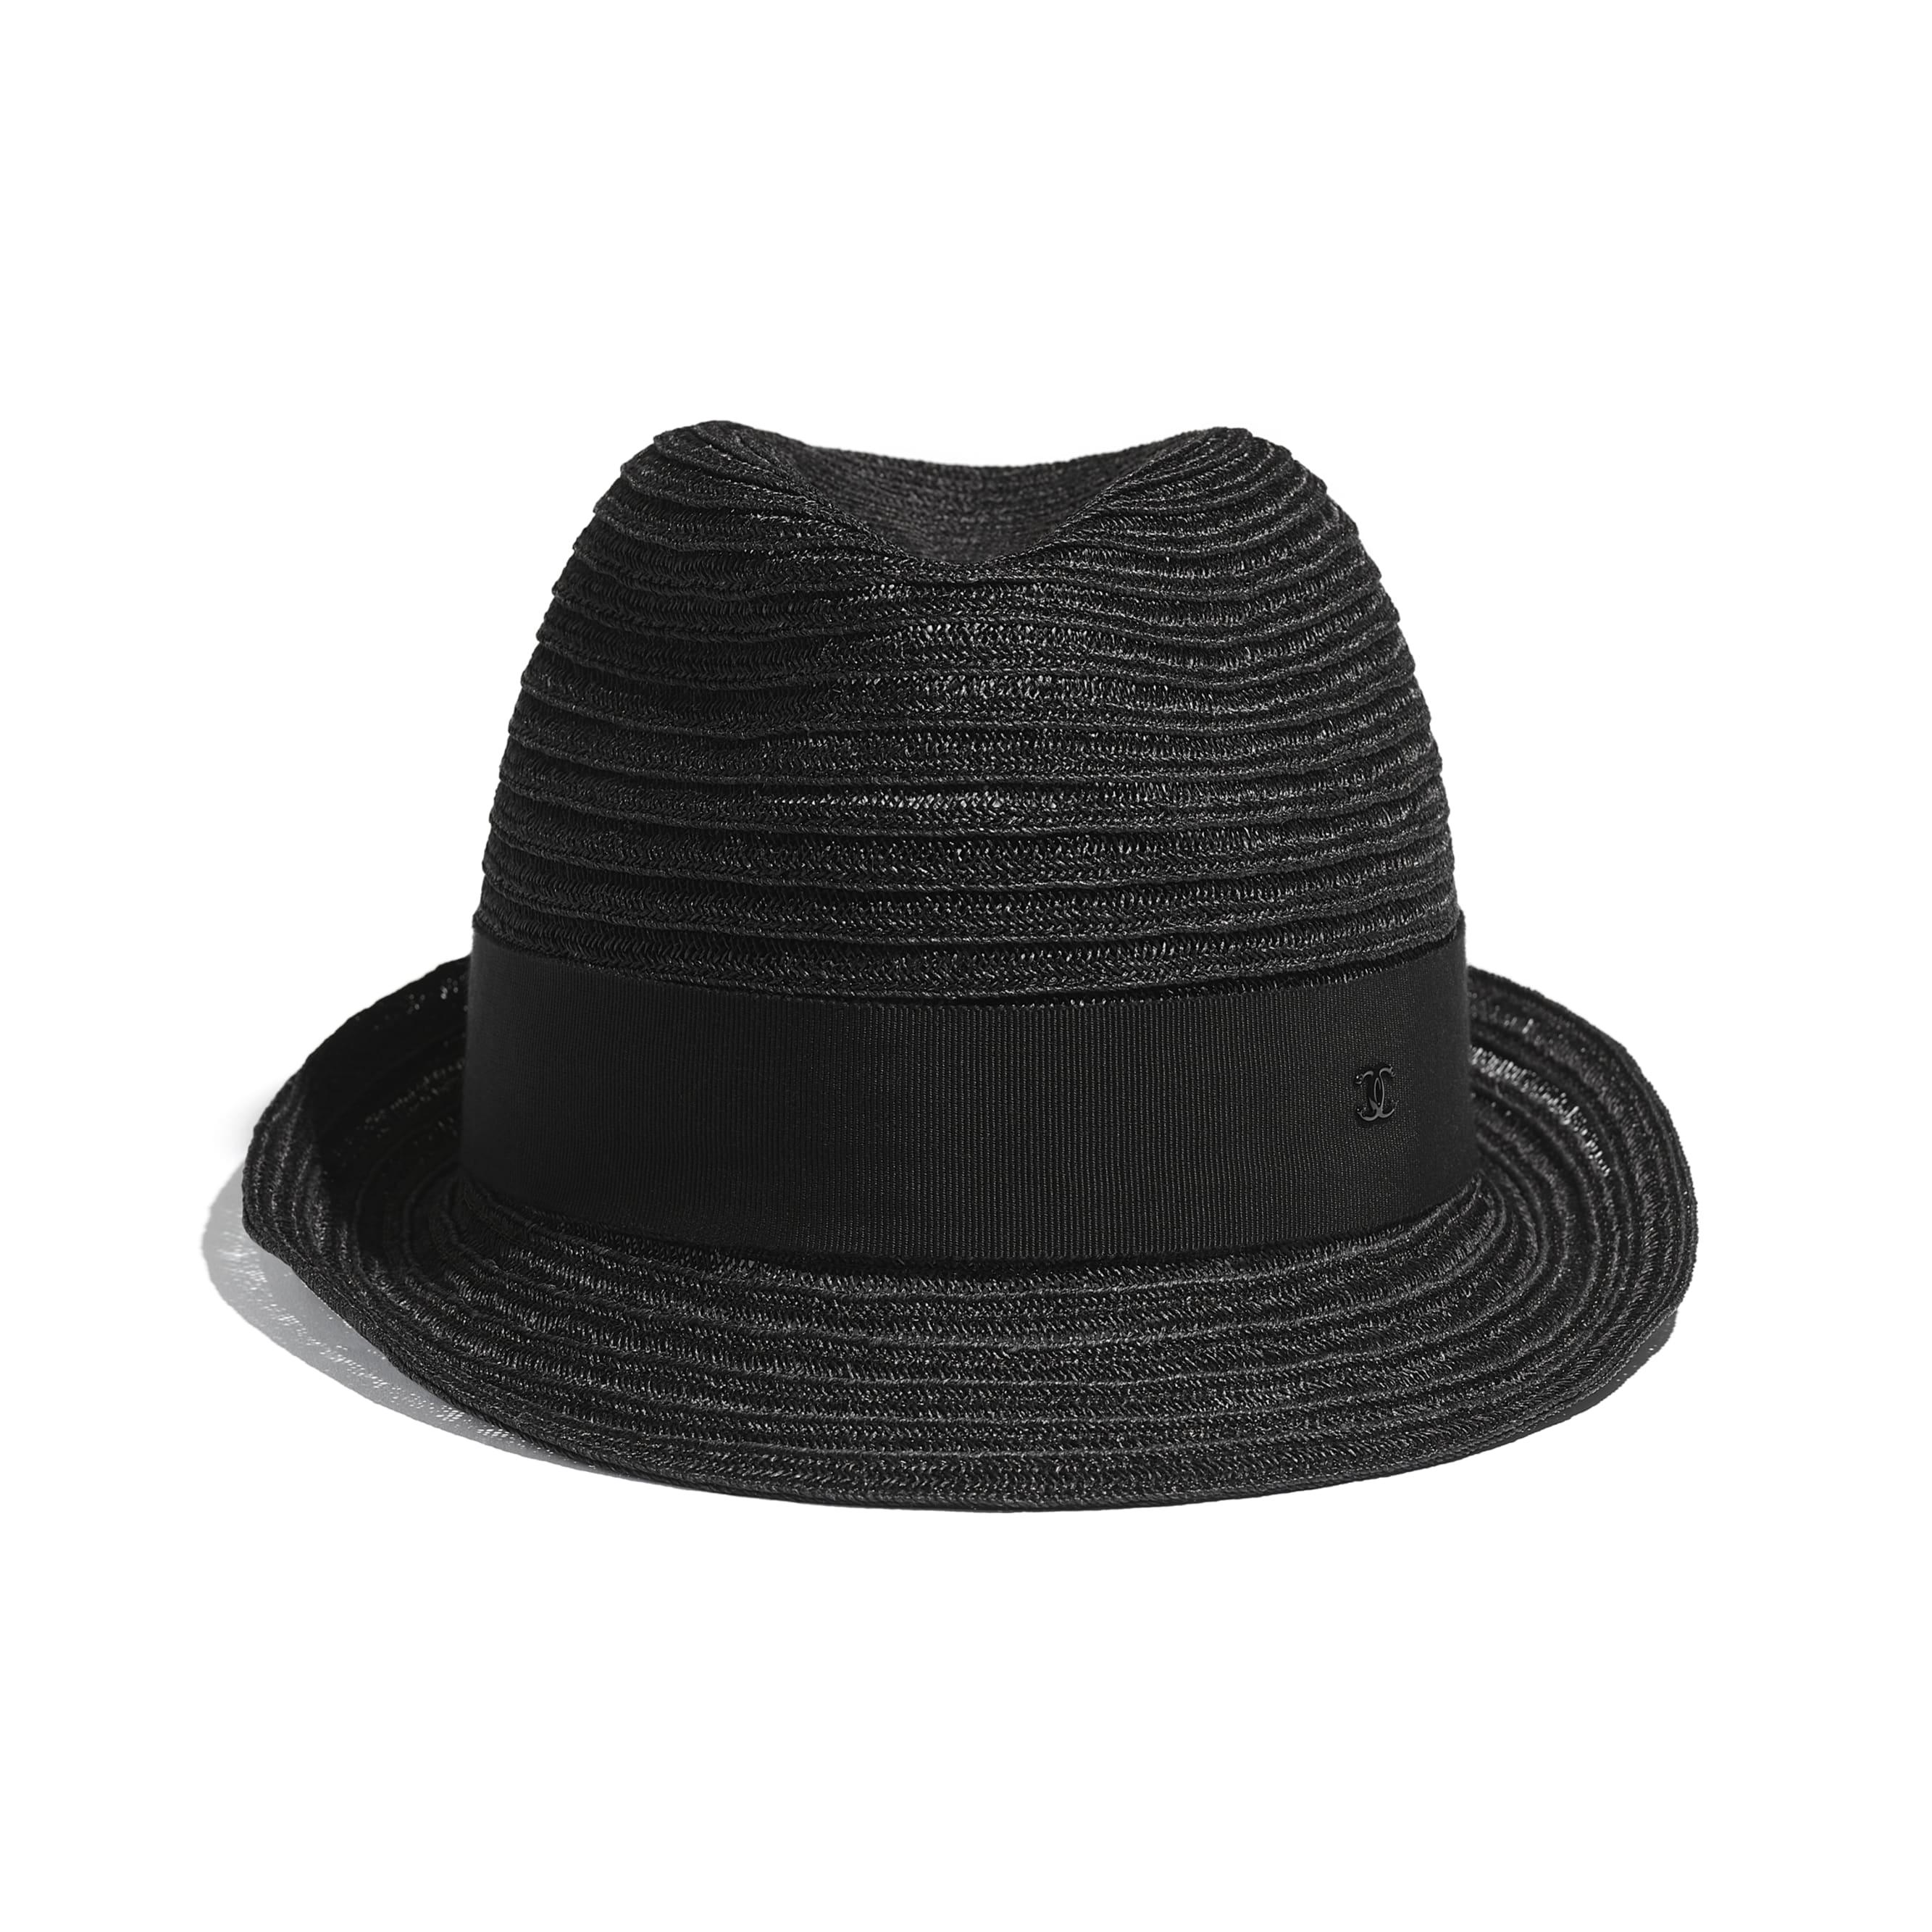 Hat - Black - Straw & Grosgrain - CHANEL - Alternative view - see standard sized version